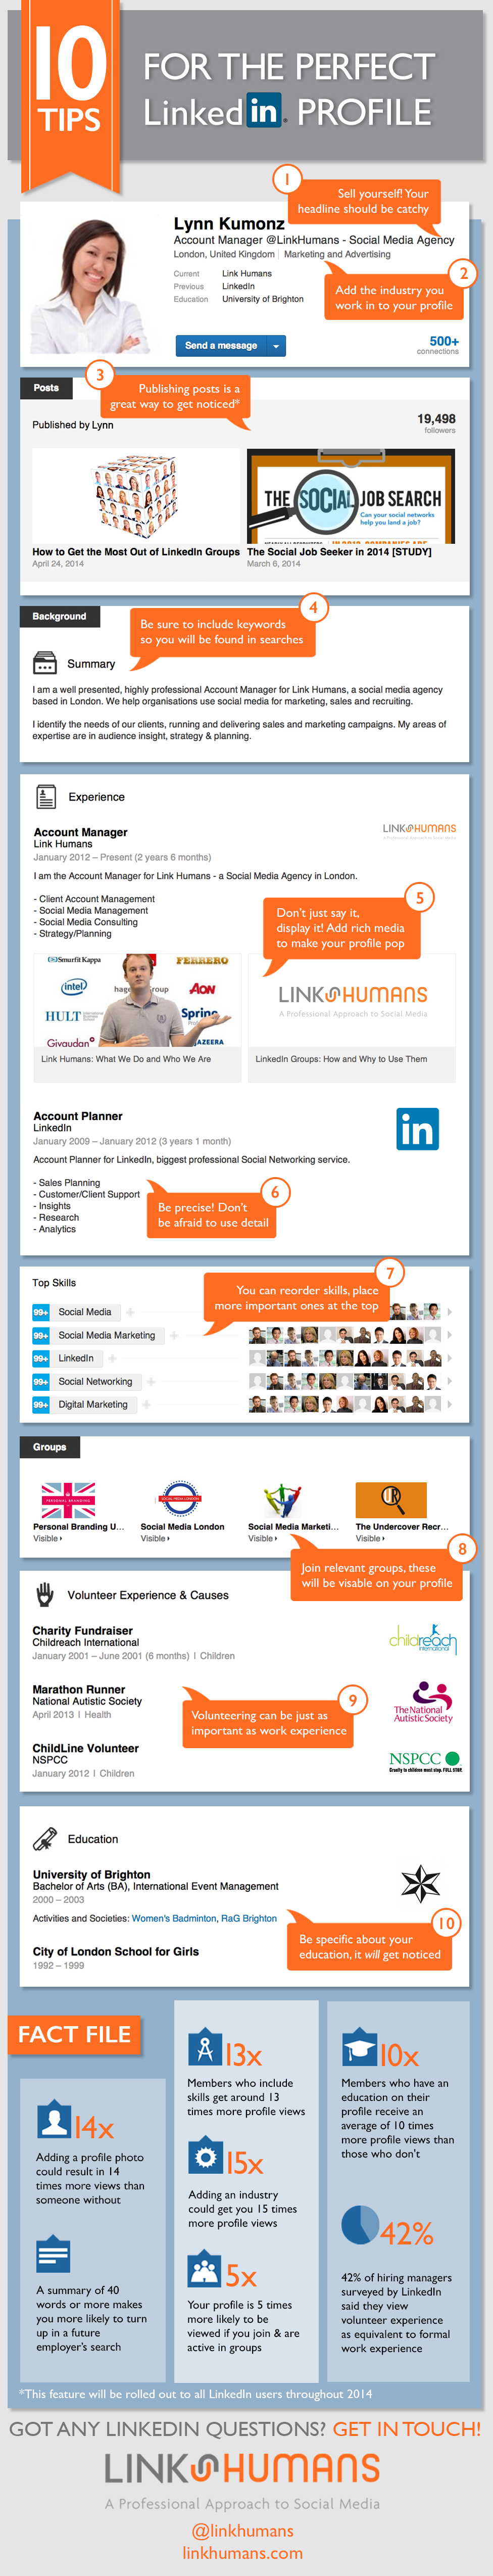 LinkedInInfog